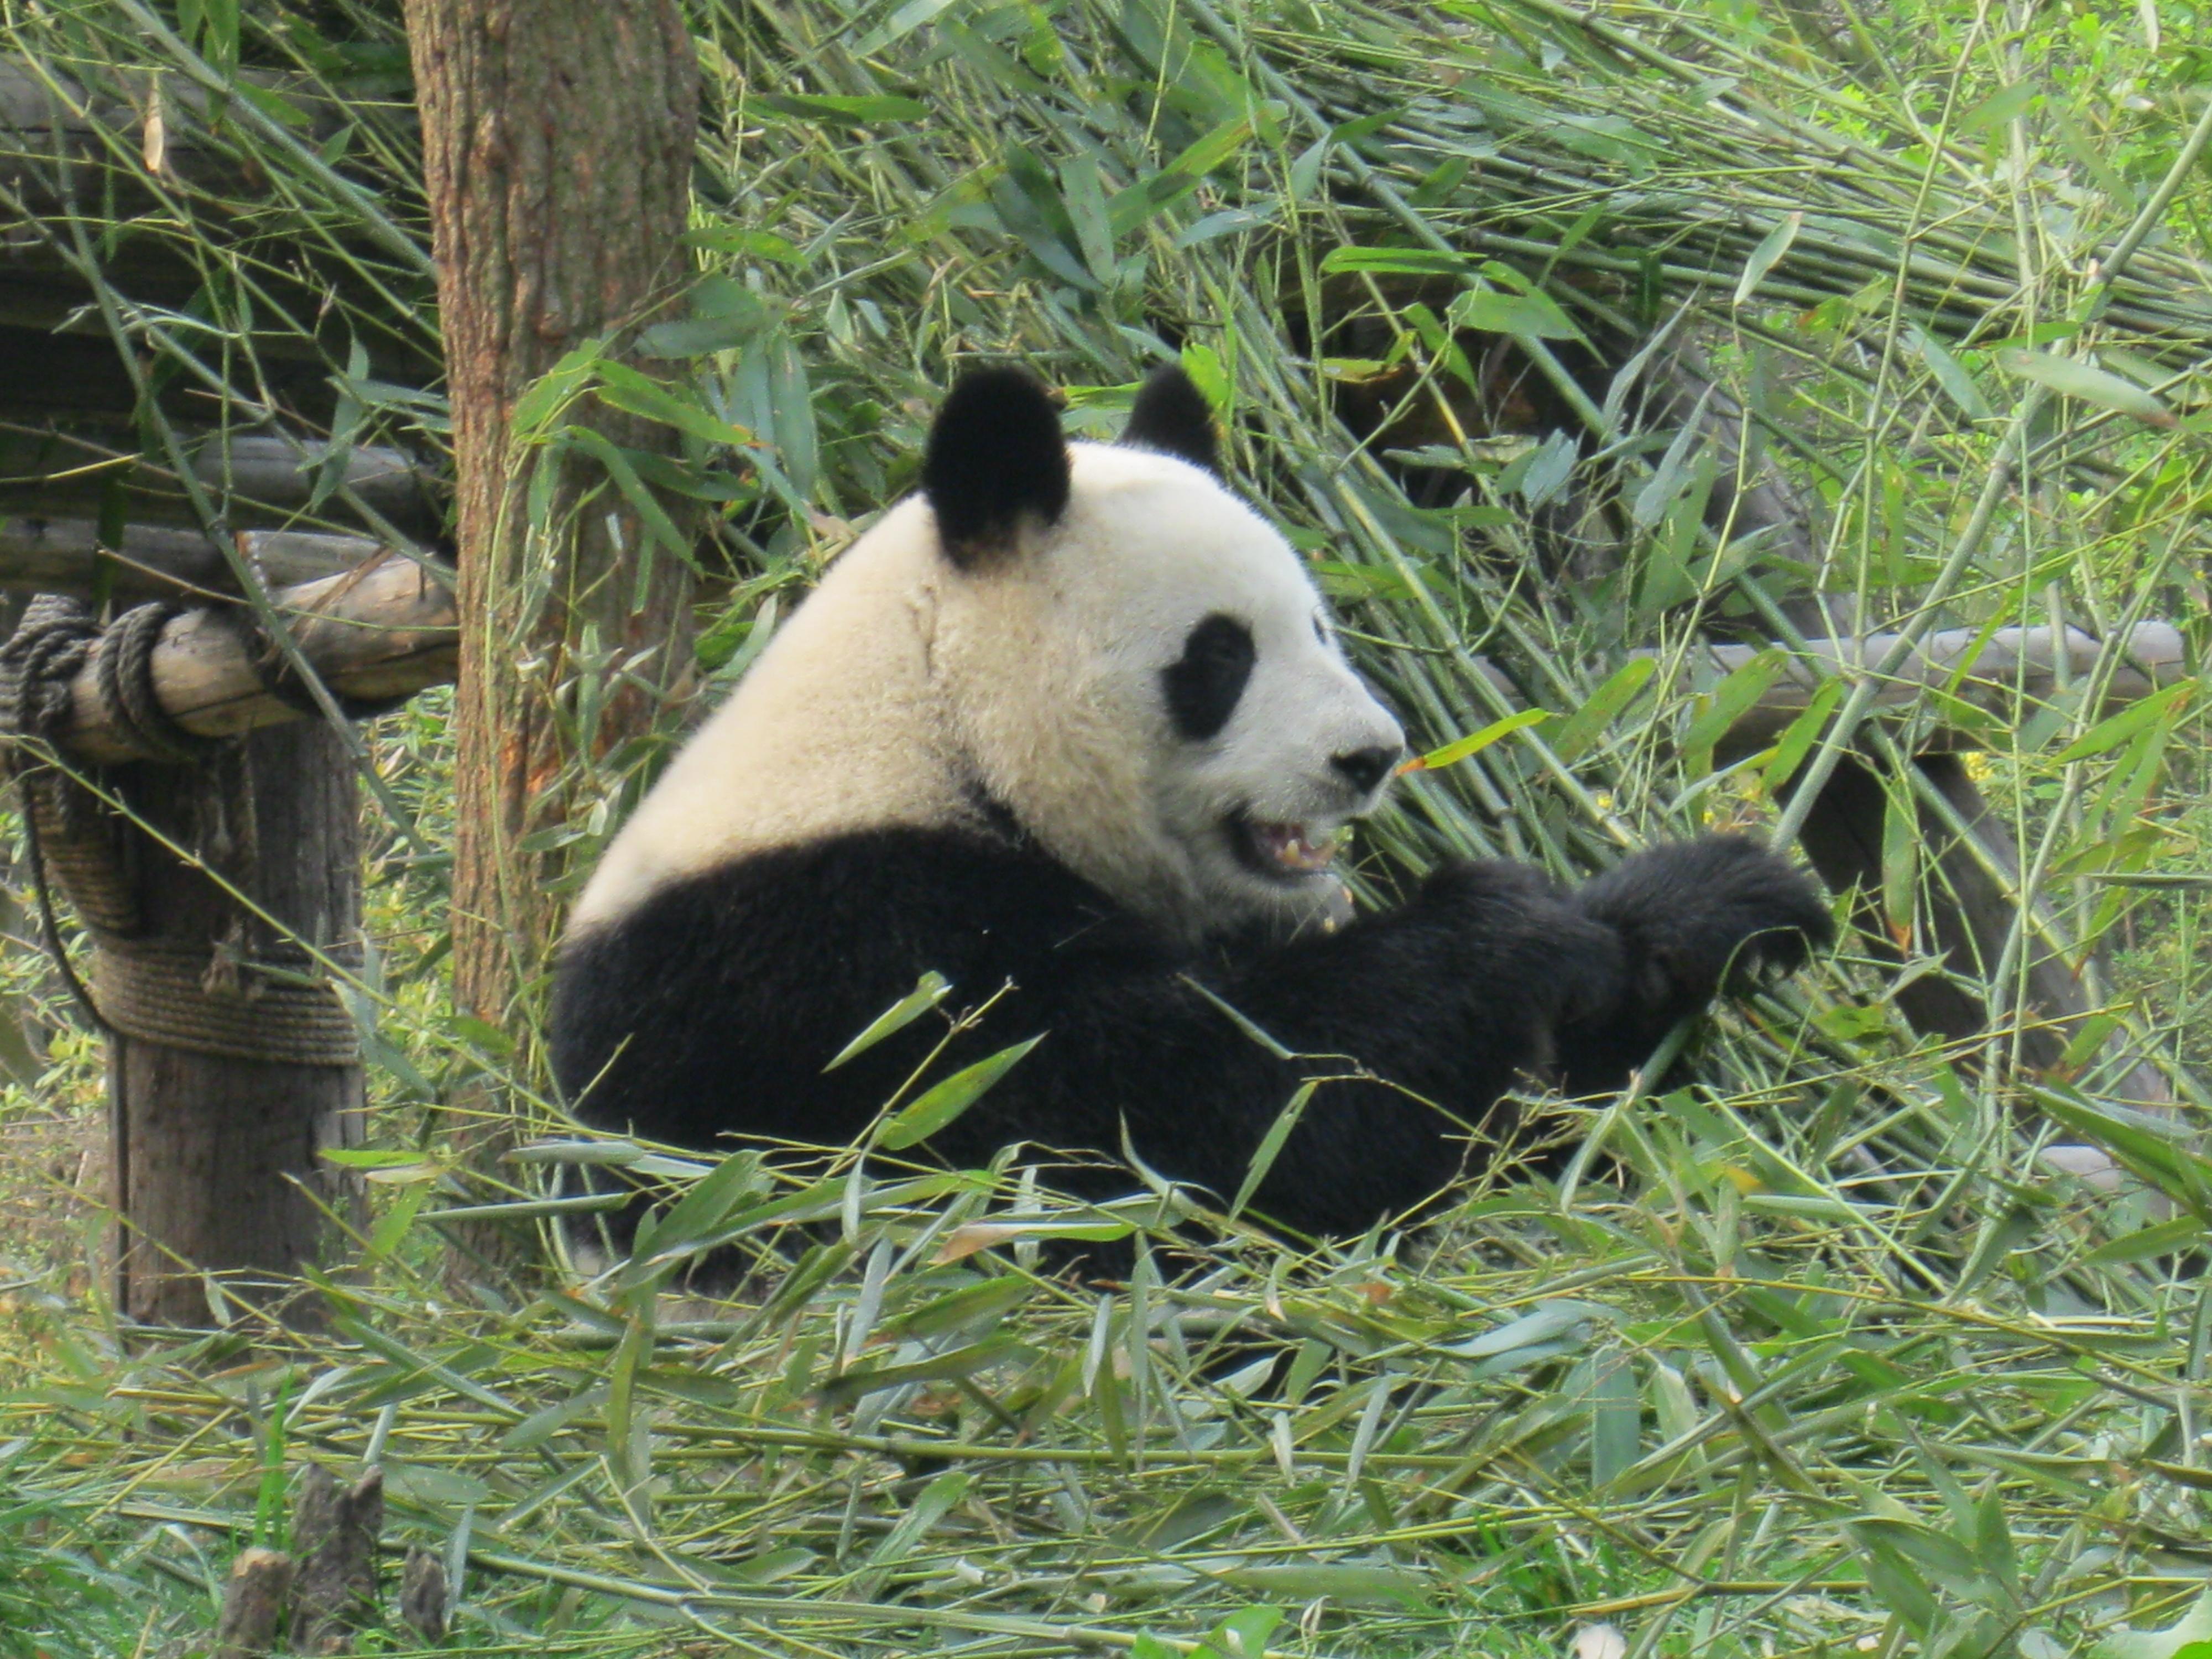 Panda Eating Bamboo ~ The chengdu panda center where is yvette